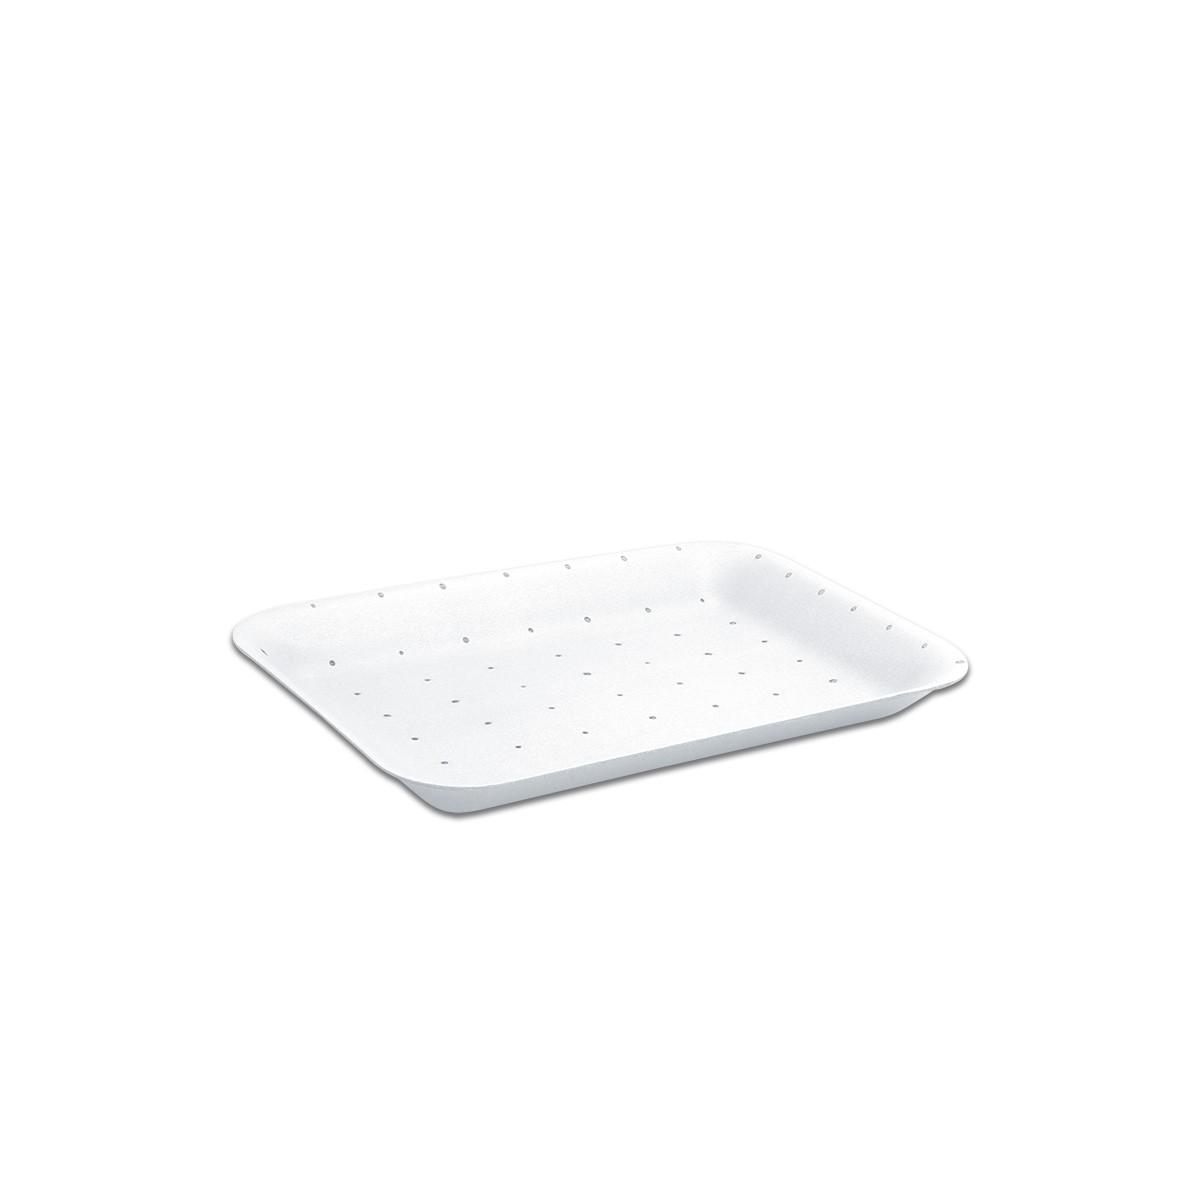 Foam Tray 216x152x20mm - Absorbent/White | 500pcs